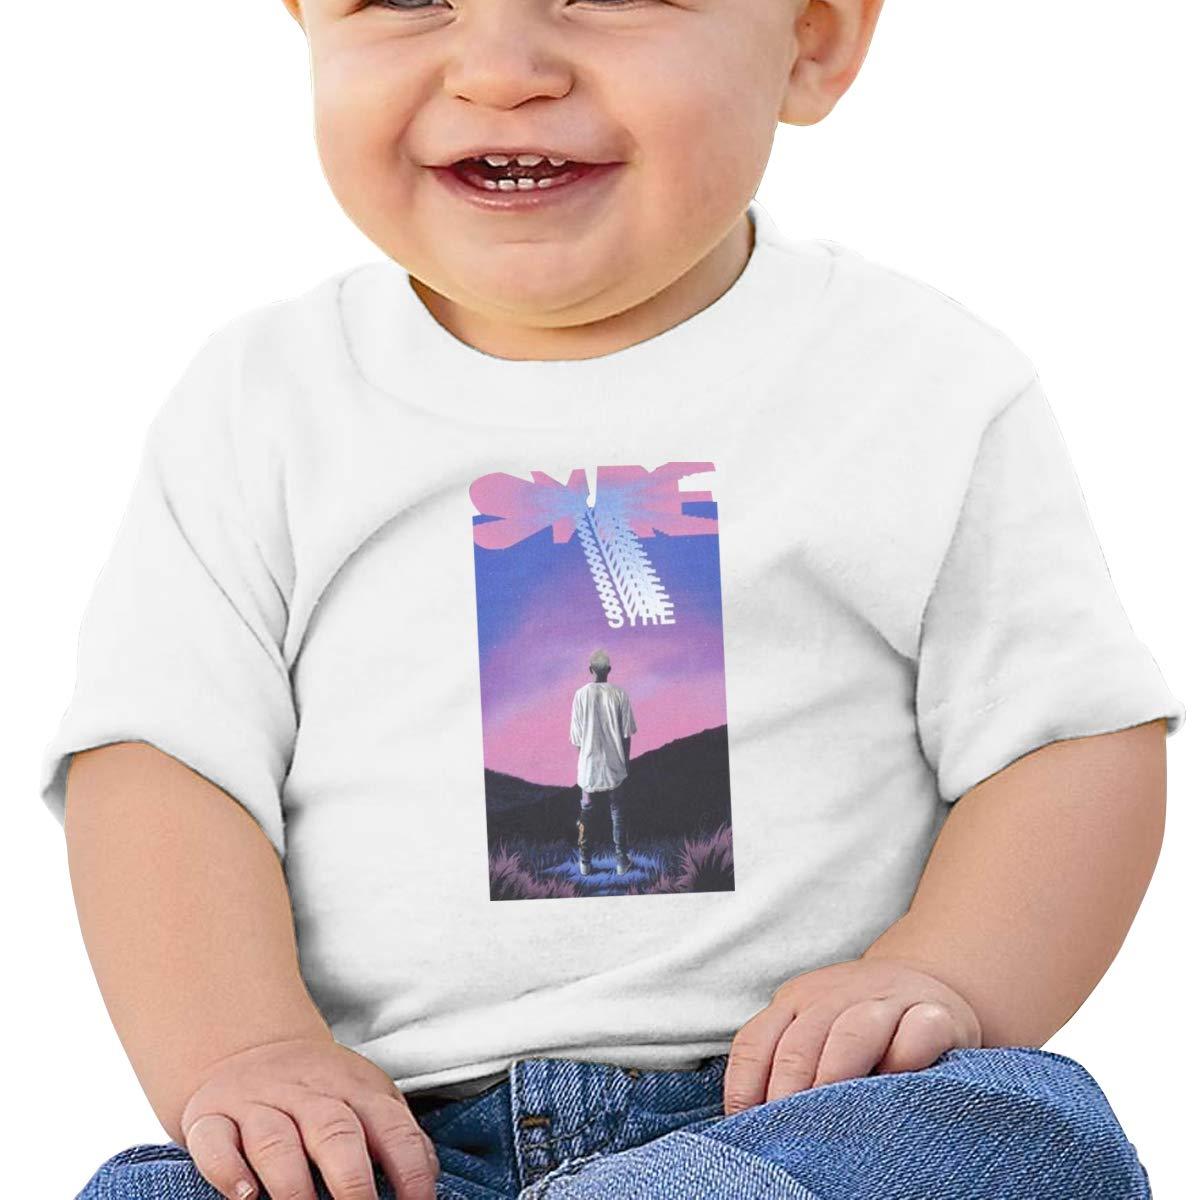 Kangtians Baby Syre Jaden Short Sleeve Shirt Toddler Tee